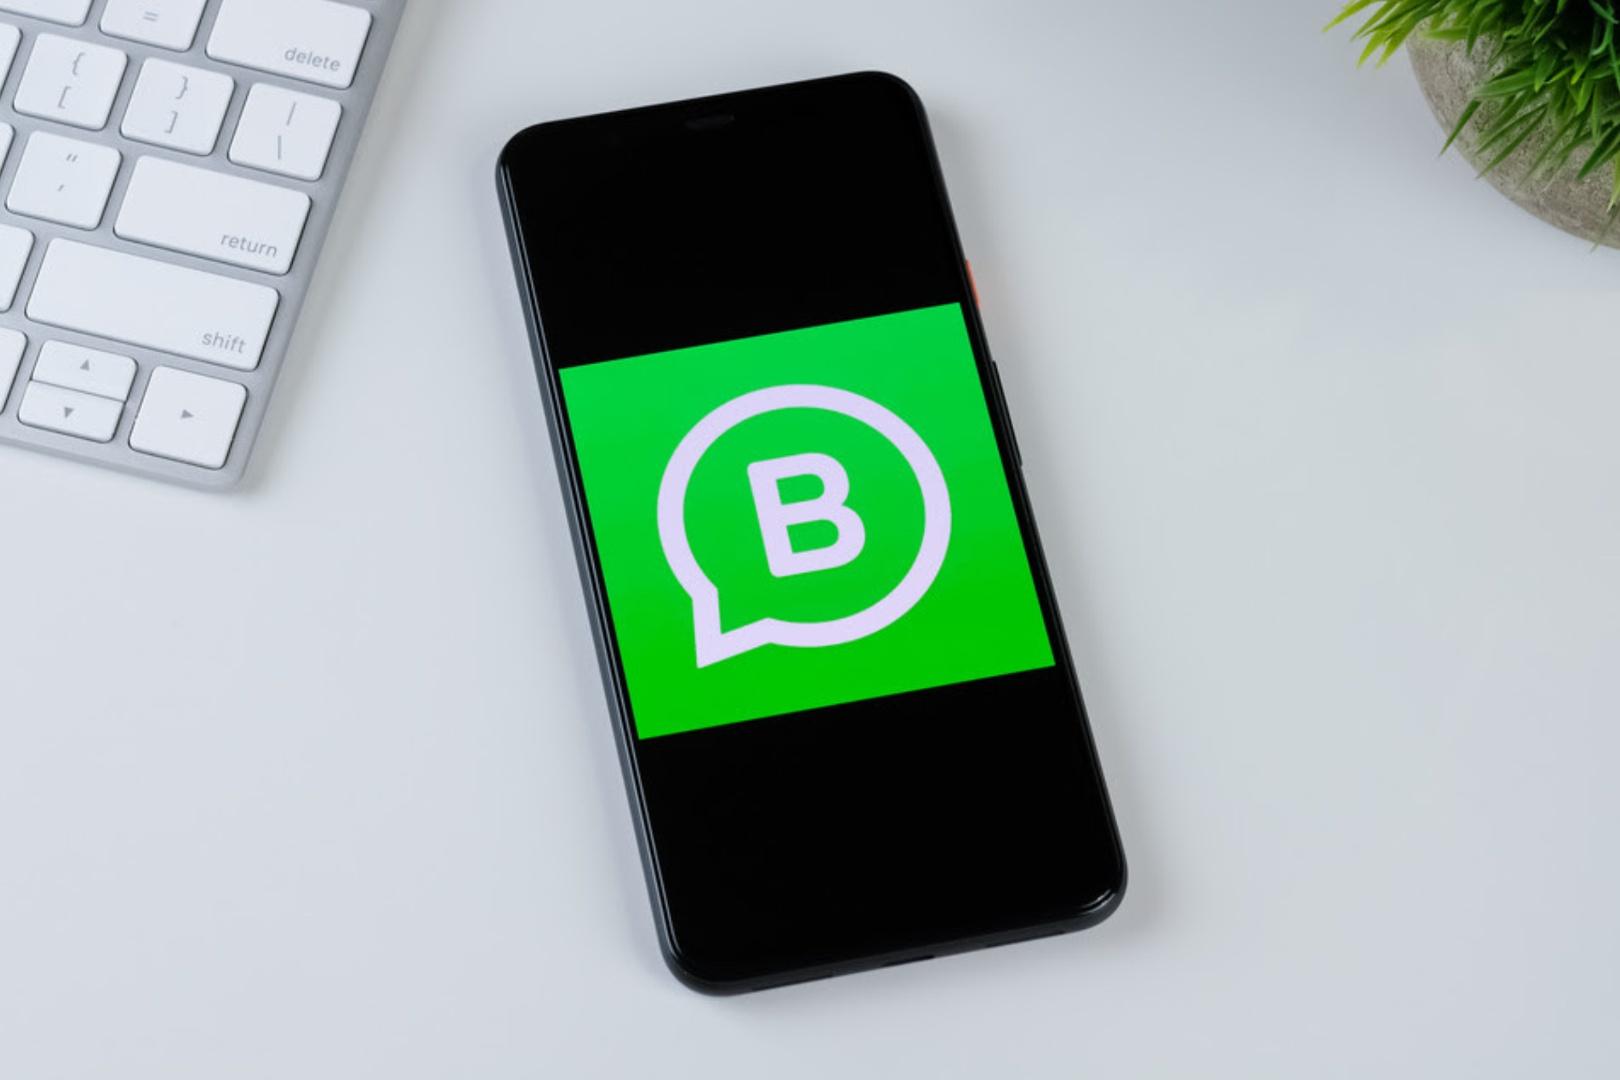 WhatsApp Business Napse Automotriz